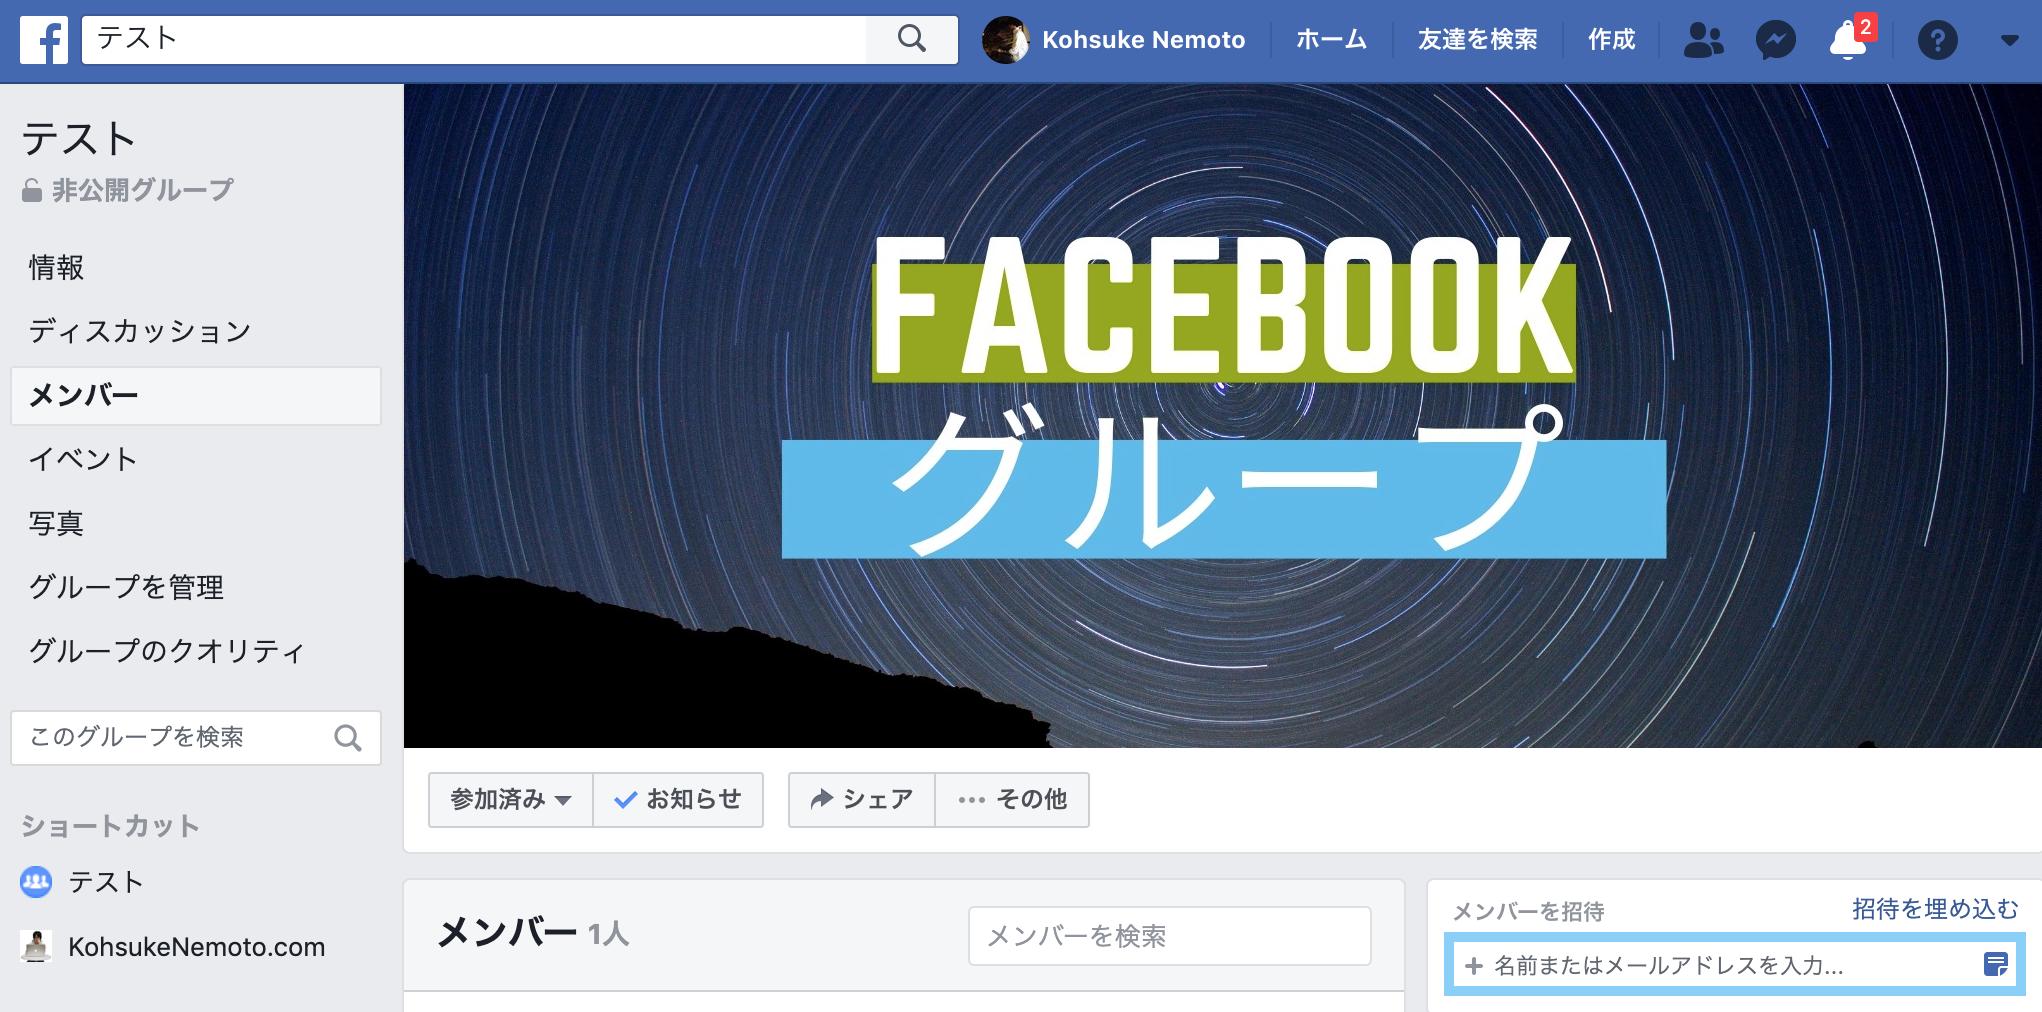 Facebookグループに友達を手動で追加する